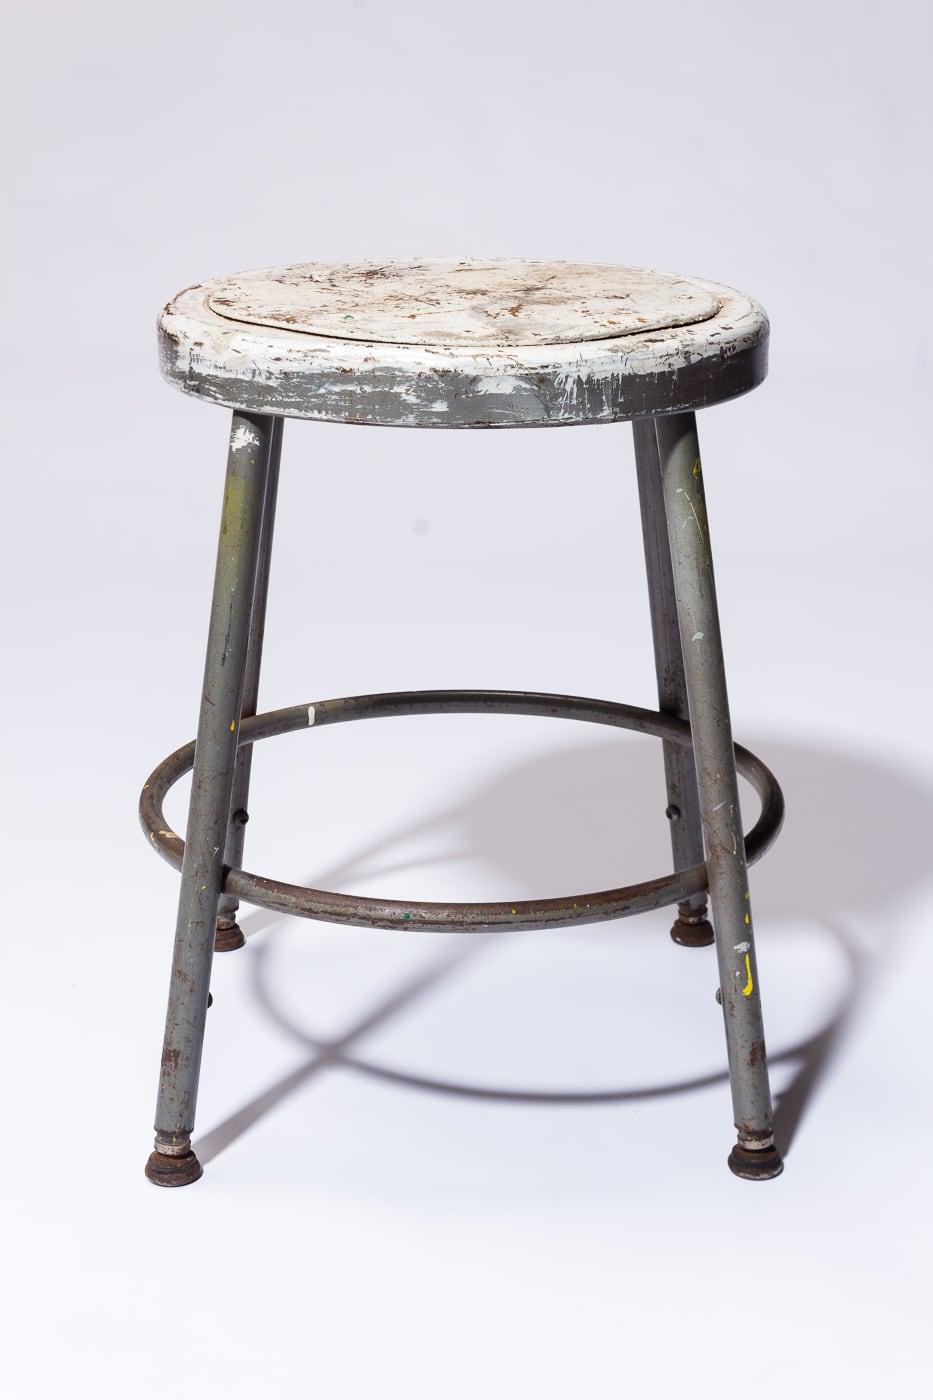 Pleasing St229 Alca Distresed Low Stool Prop Rental Acme Brooklyn Uwap Interior Chair Design Uwaporg